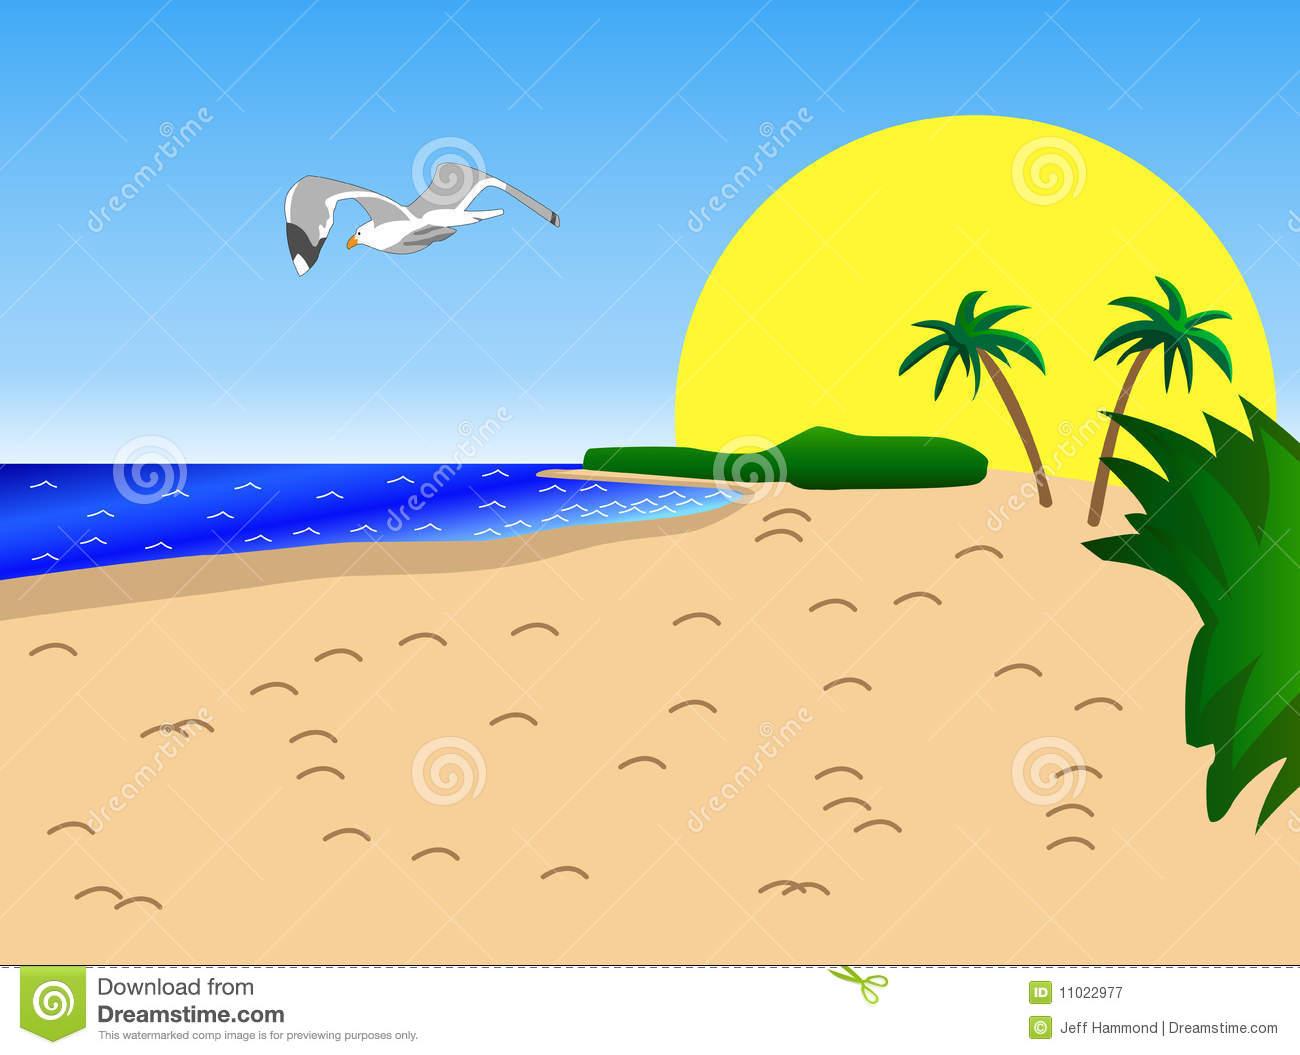 Palm Tree clipart caribbean food Tree sandy with beach trees